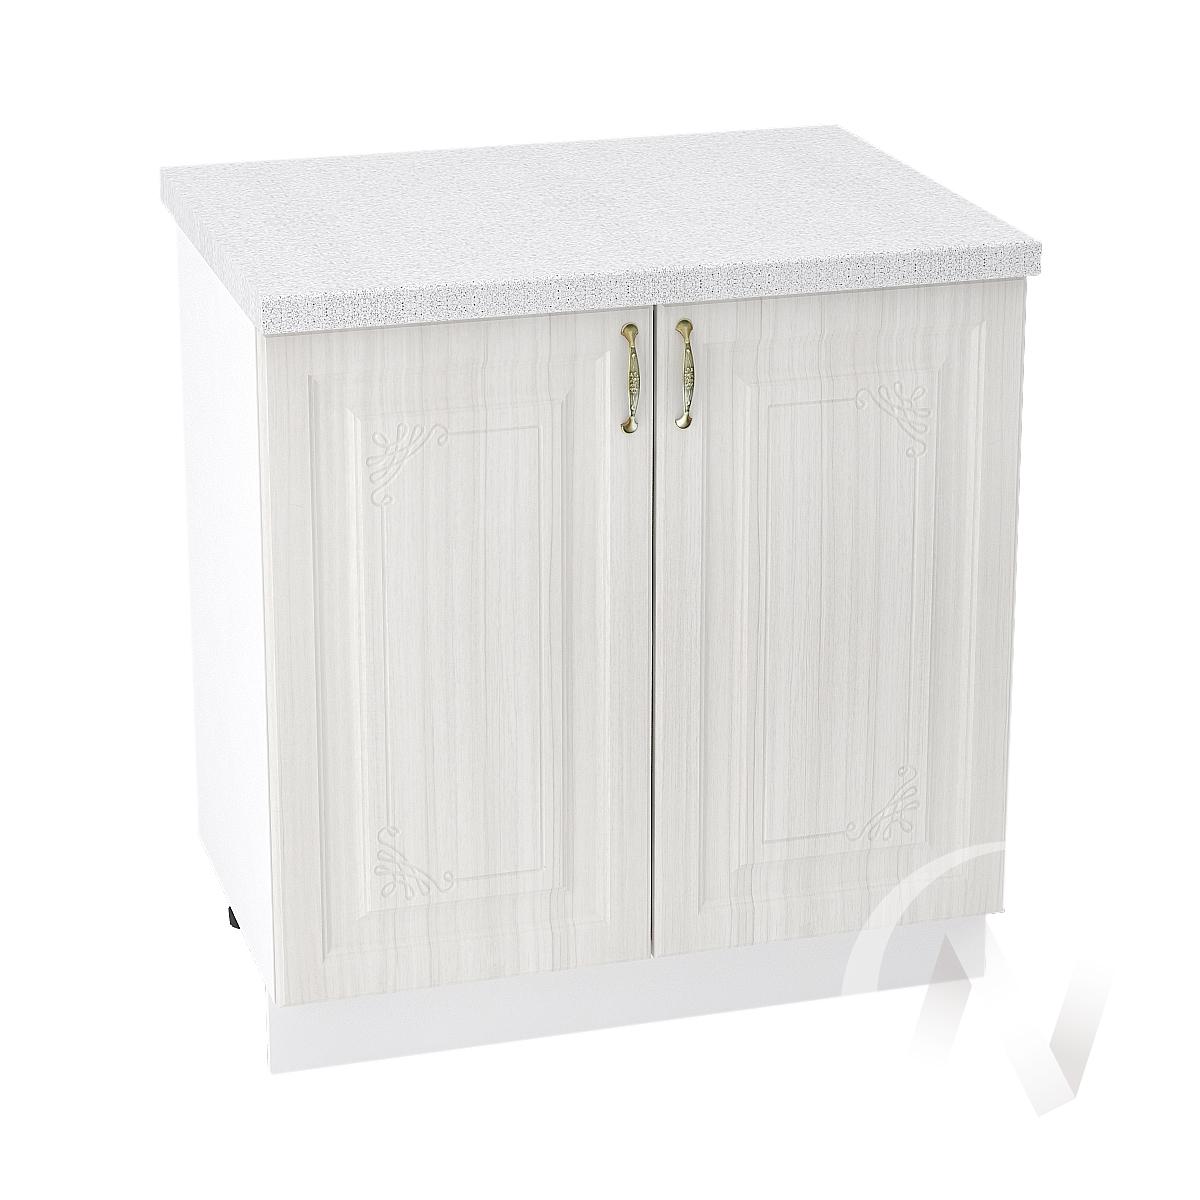 "Кухня ""Виктория"": Шкаф нижний 800, ШН 800 (корпус белый)"